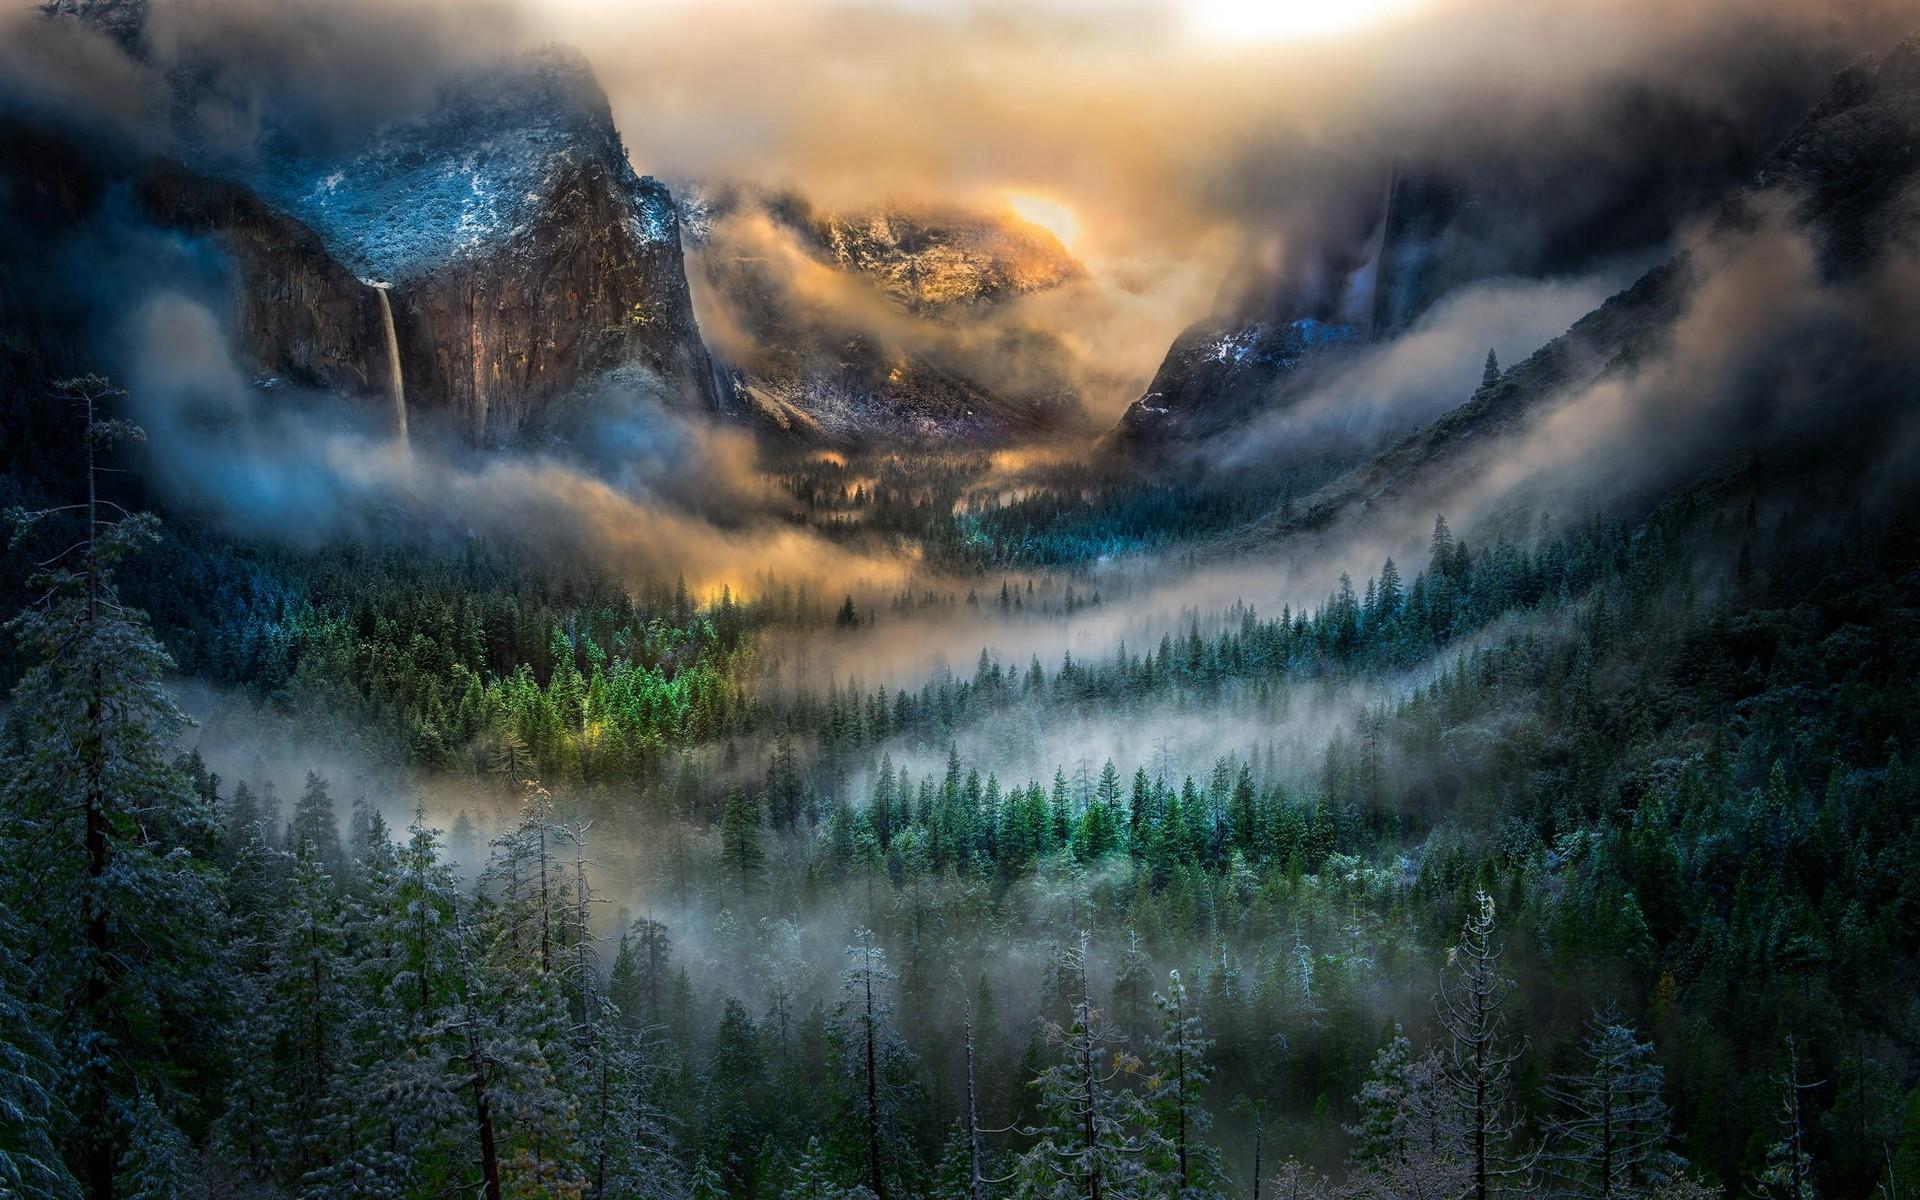 Water Fall Hd Wallpaper 4k Nature Landscape Mountain Mist Yosemite Valley Winter